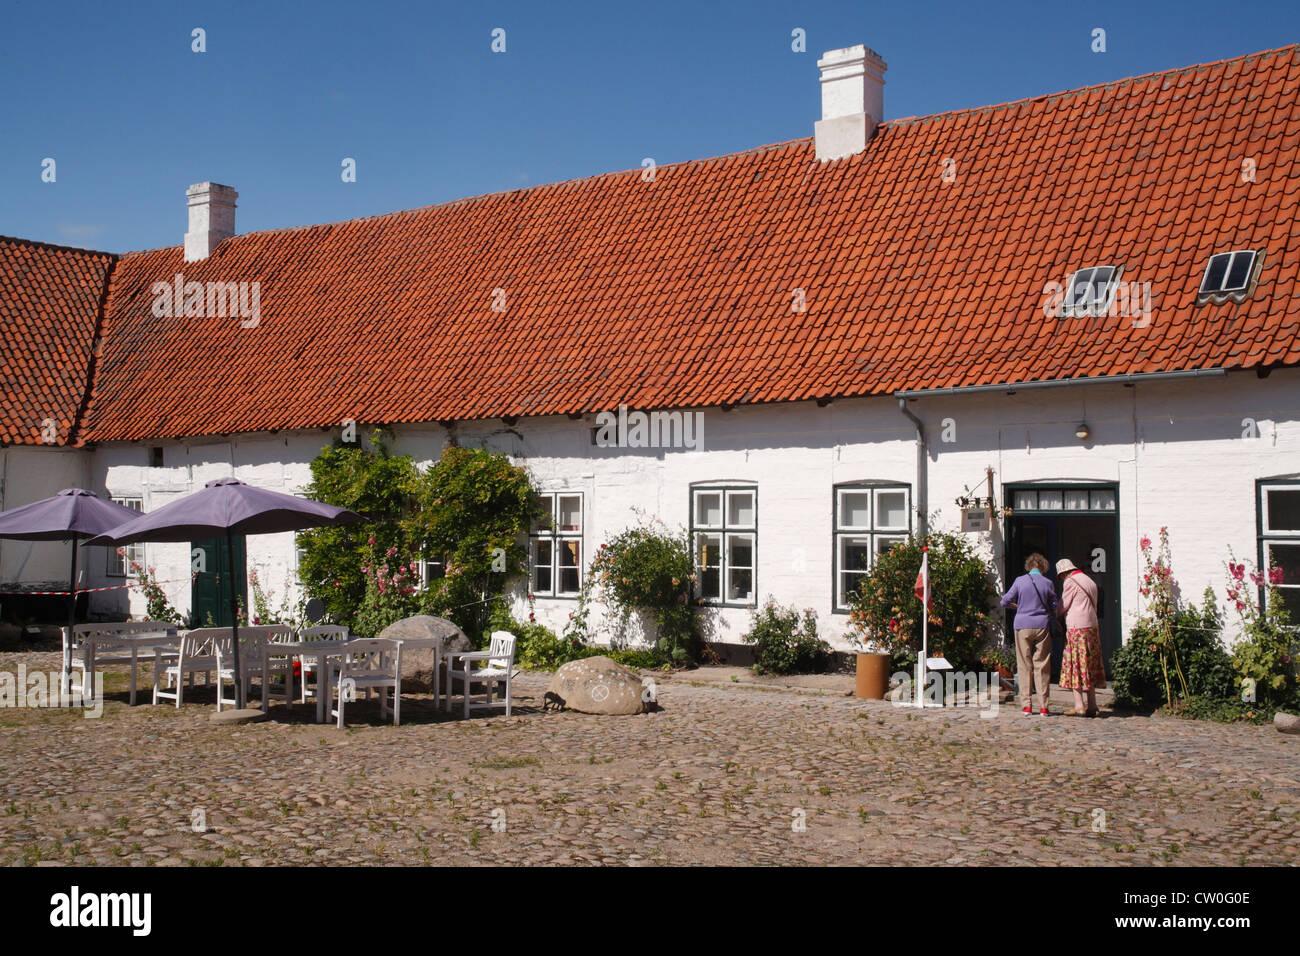 Denmark Sjaelland Kalundborg, museum - Stock Image